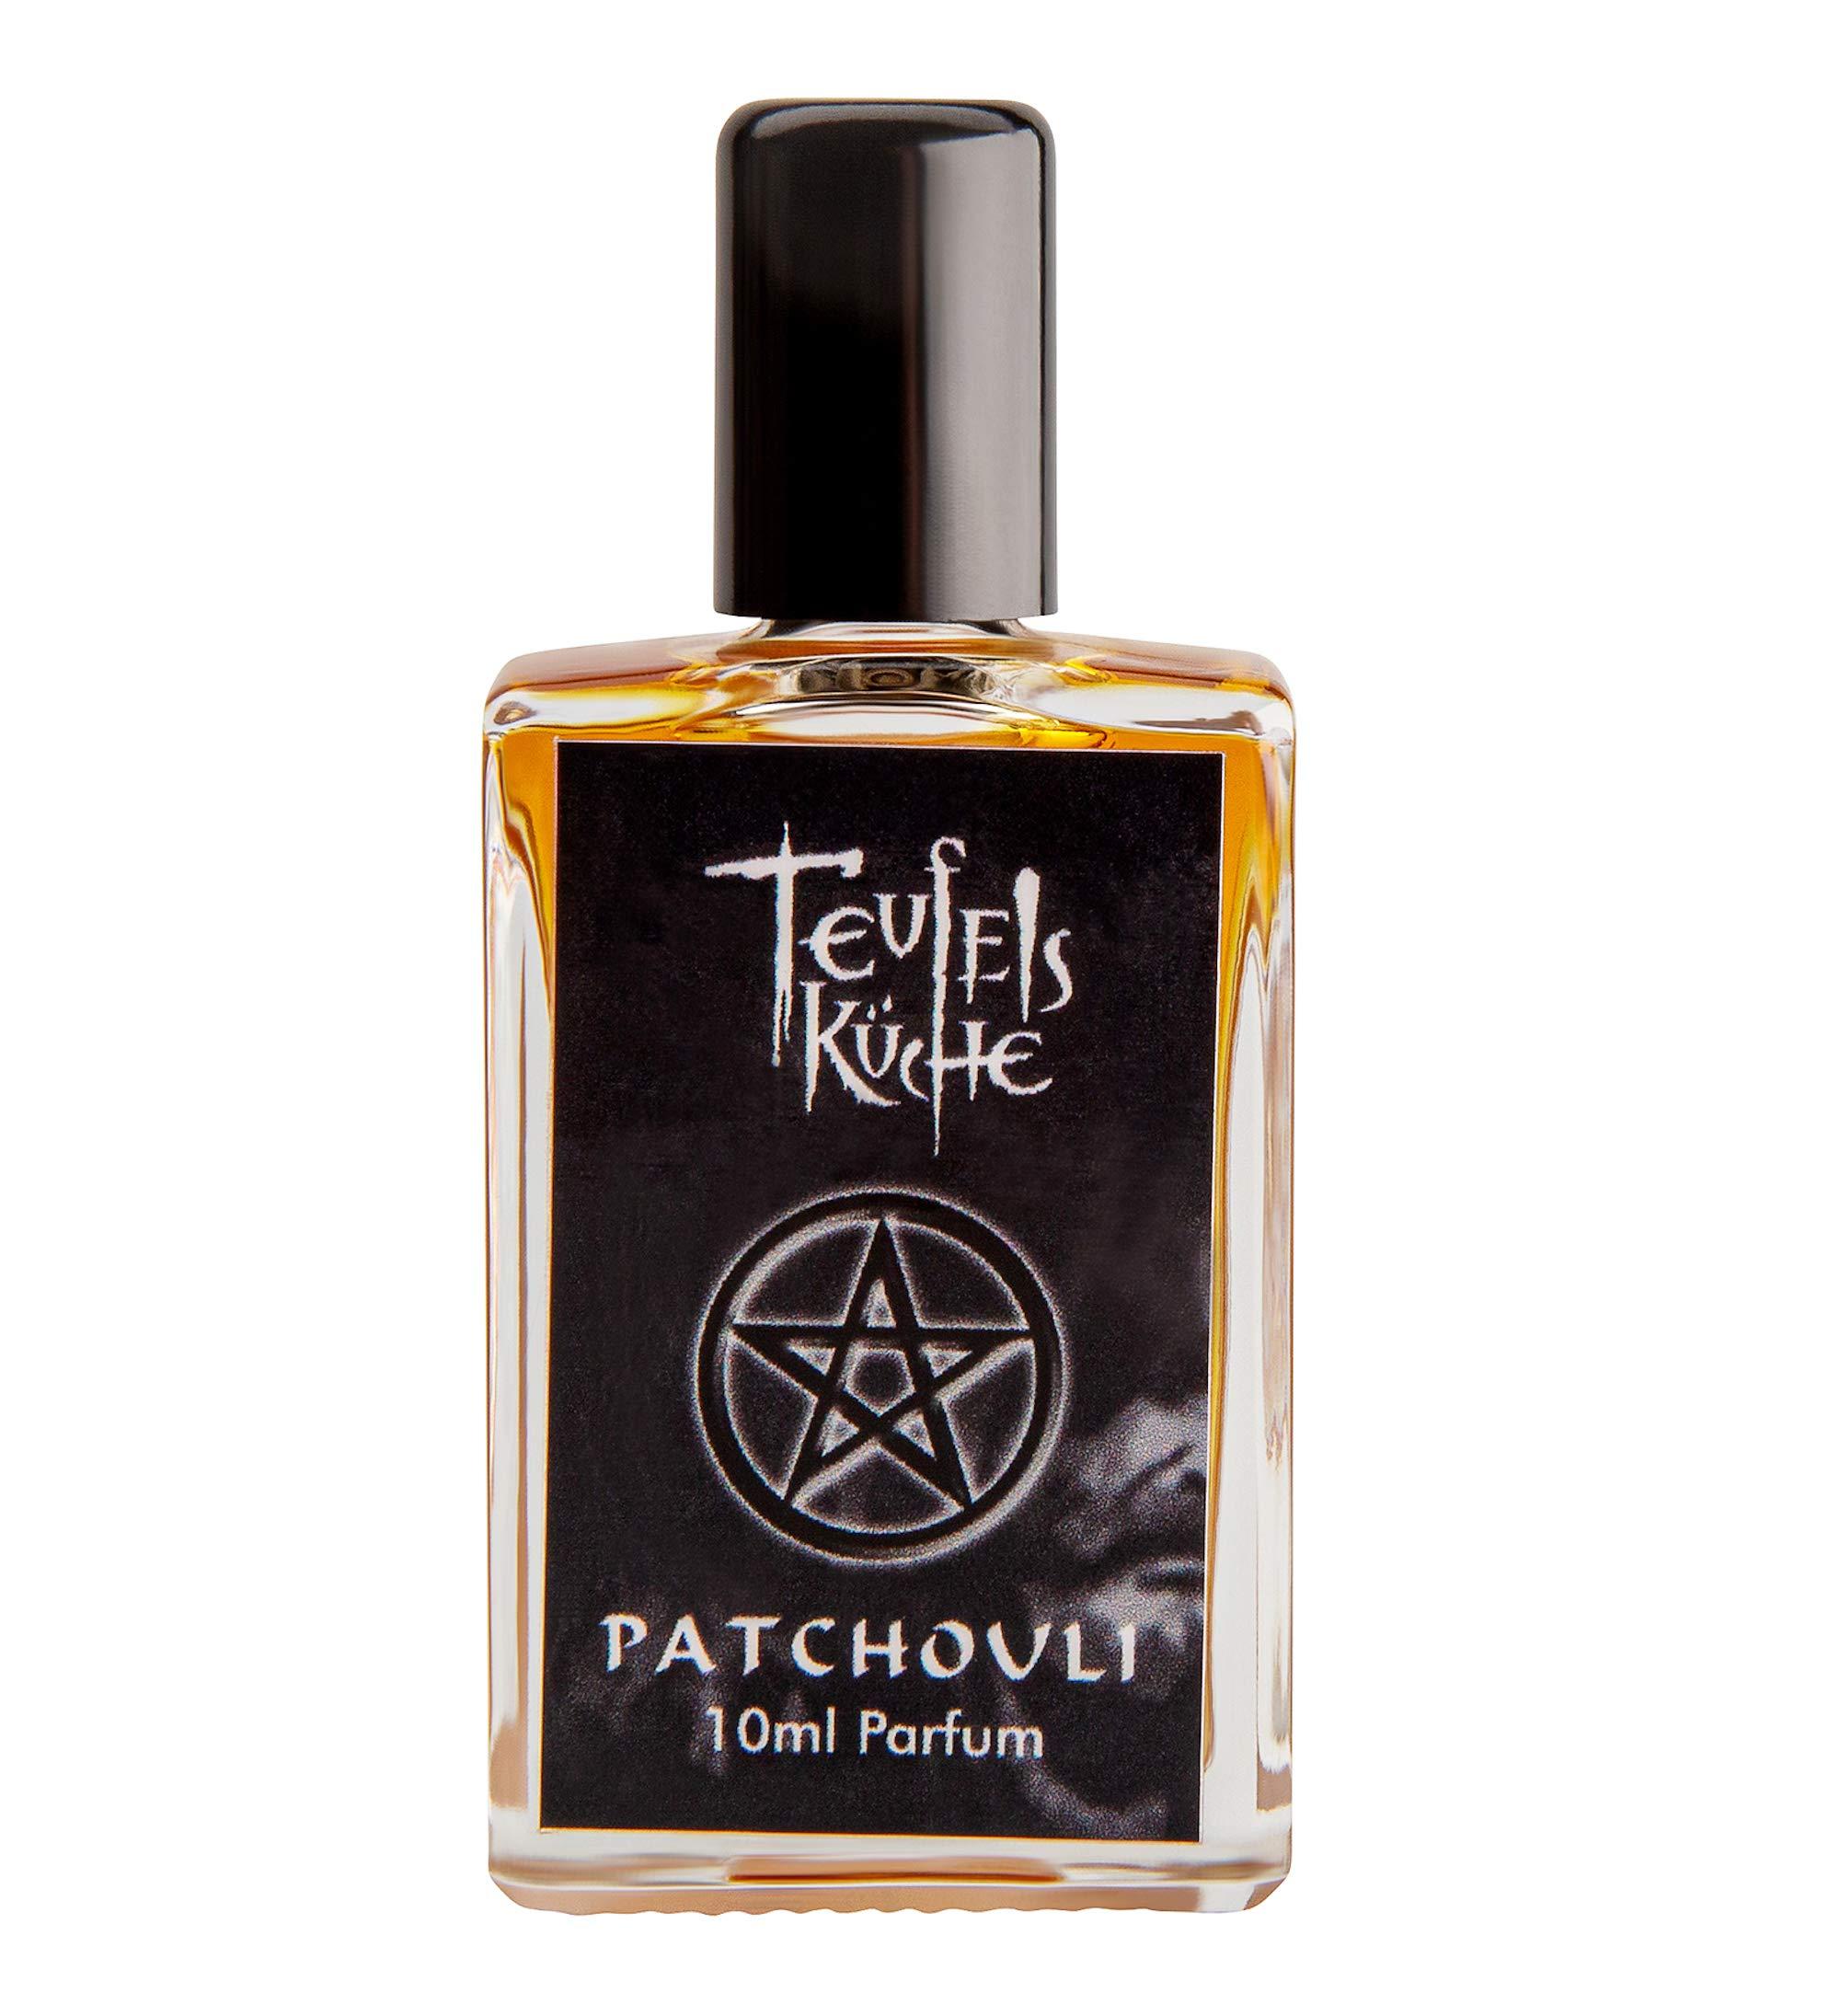 Original Teufelsküche Patchouli Perfume, 10 ml, Gothic Perfume, Pure Patchouli Gothic